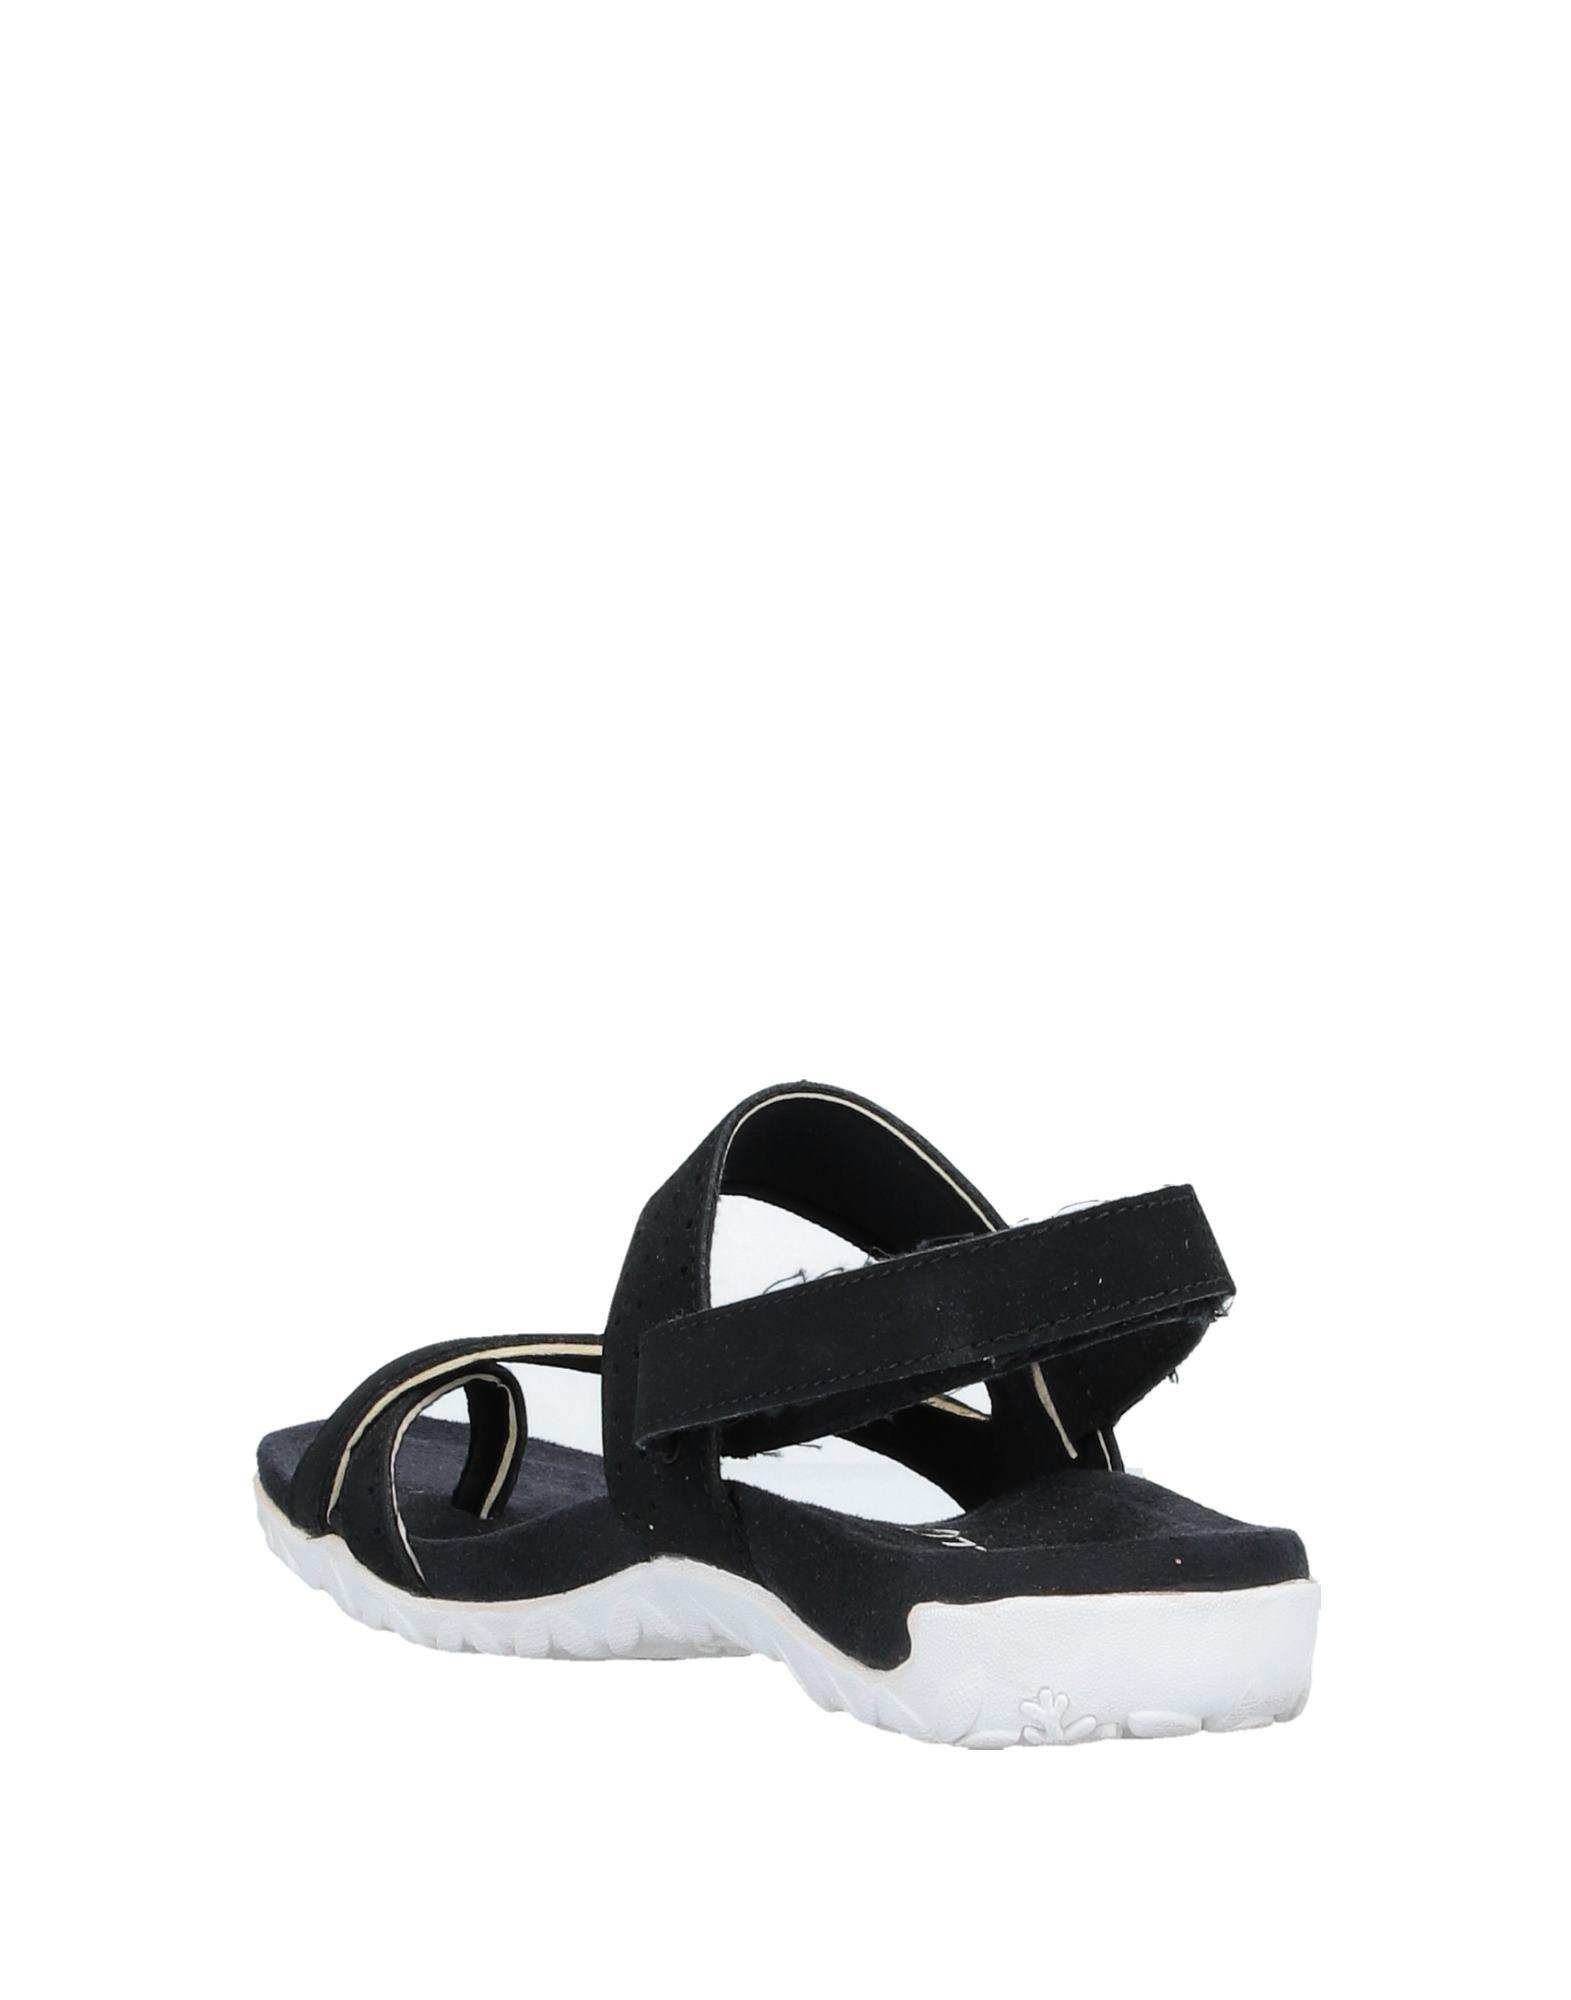 Sandales Merrell en coloris Noir